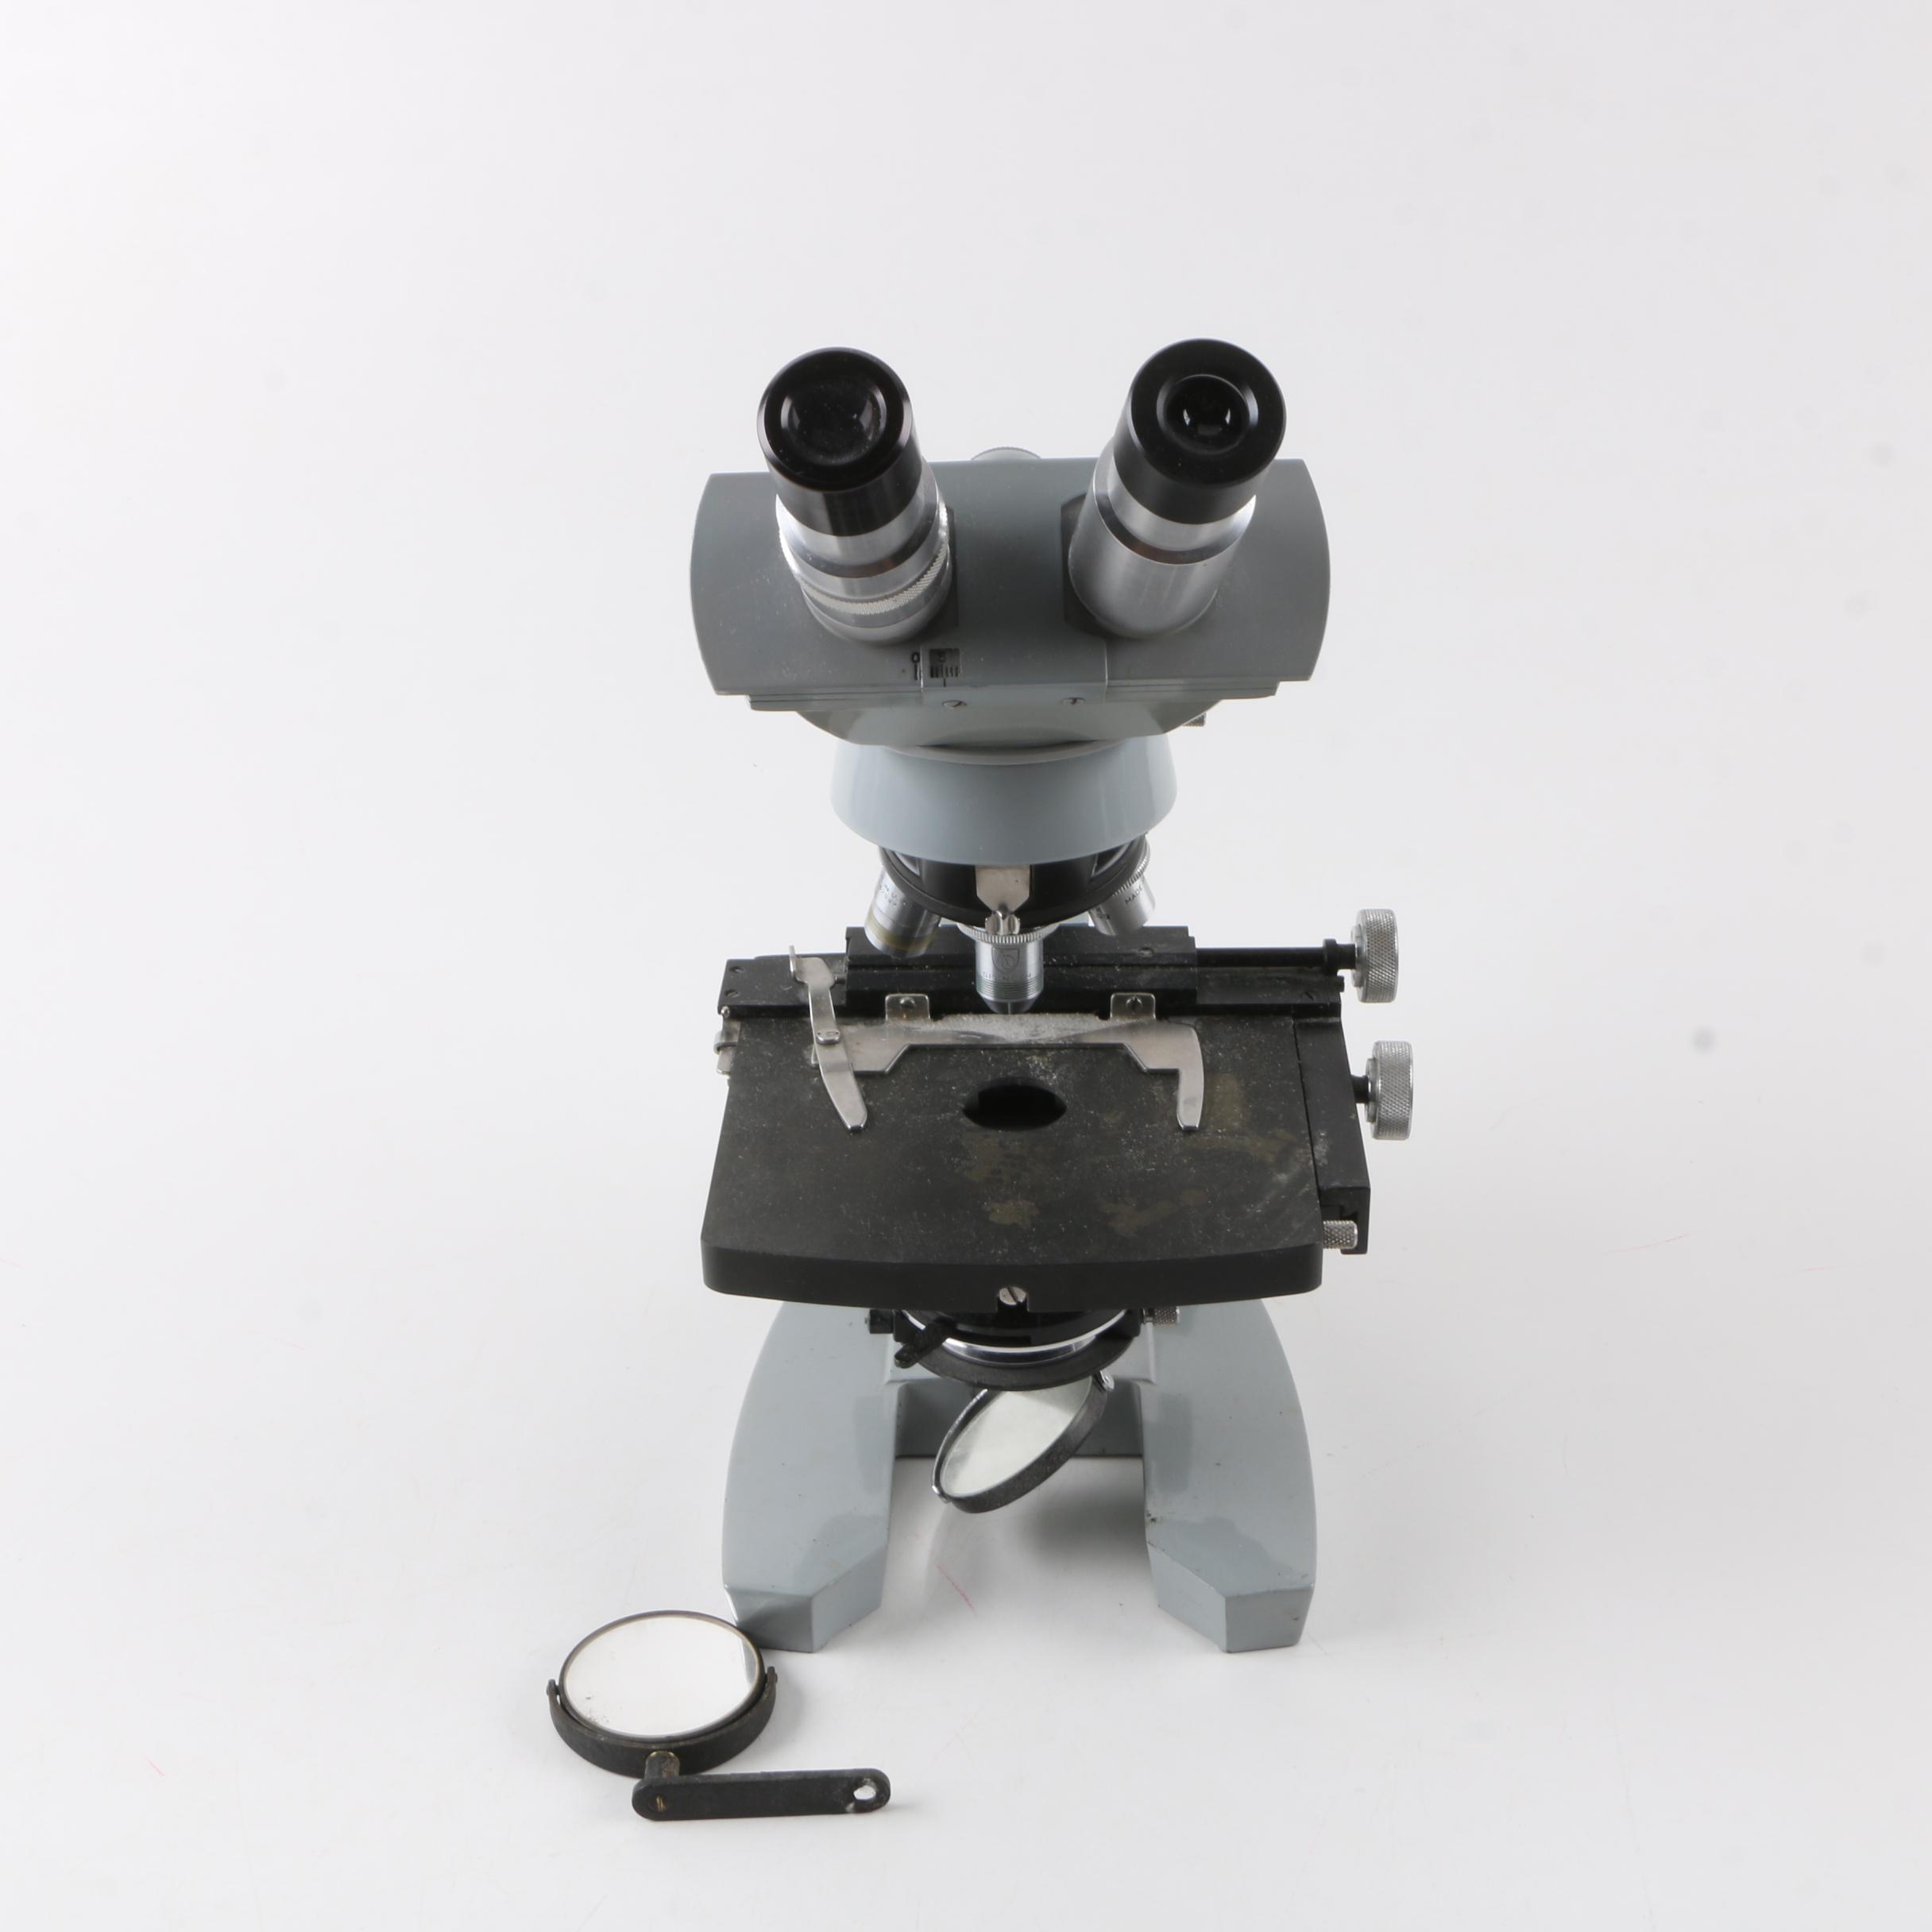 American Optics Spencer Binocular Microscope